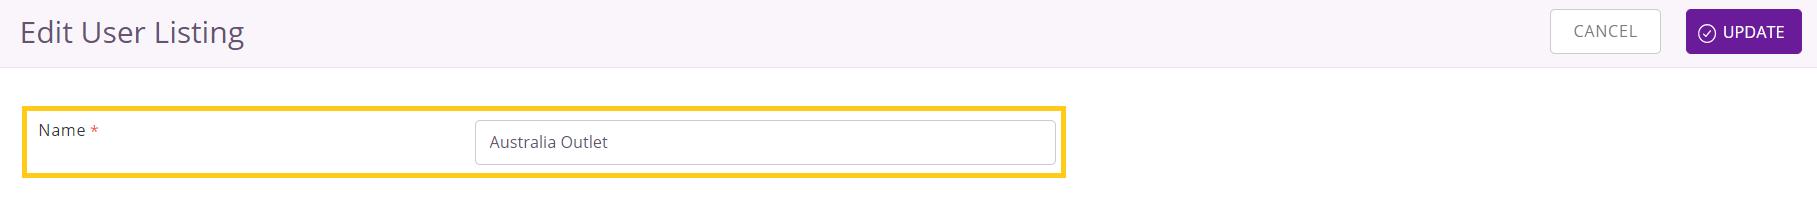 Edit user listing